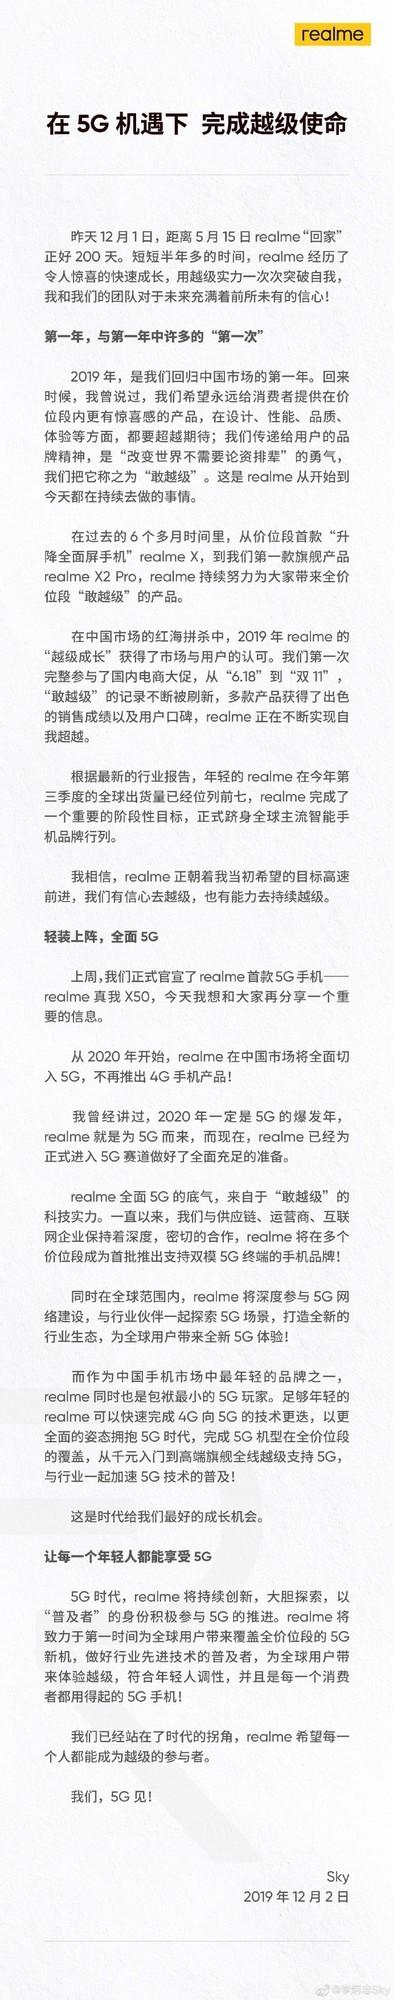 realme官宣不再发布4G手机 全面进入5G时代